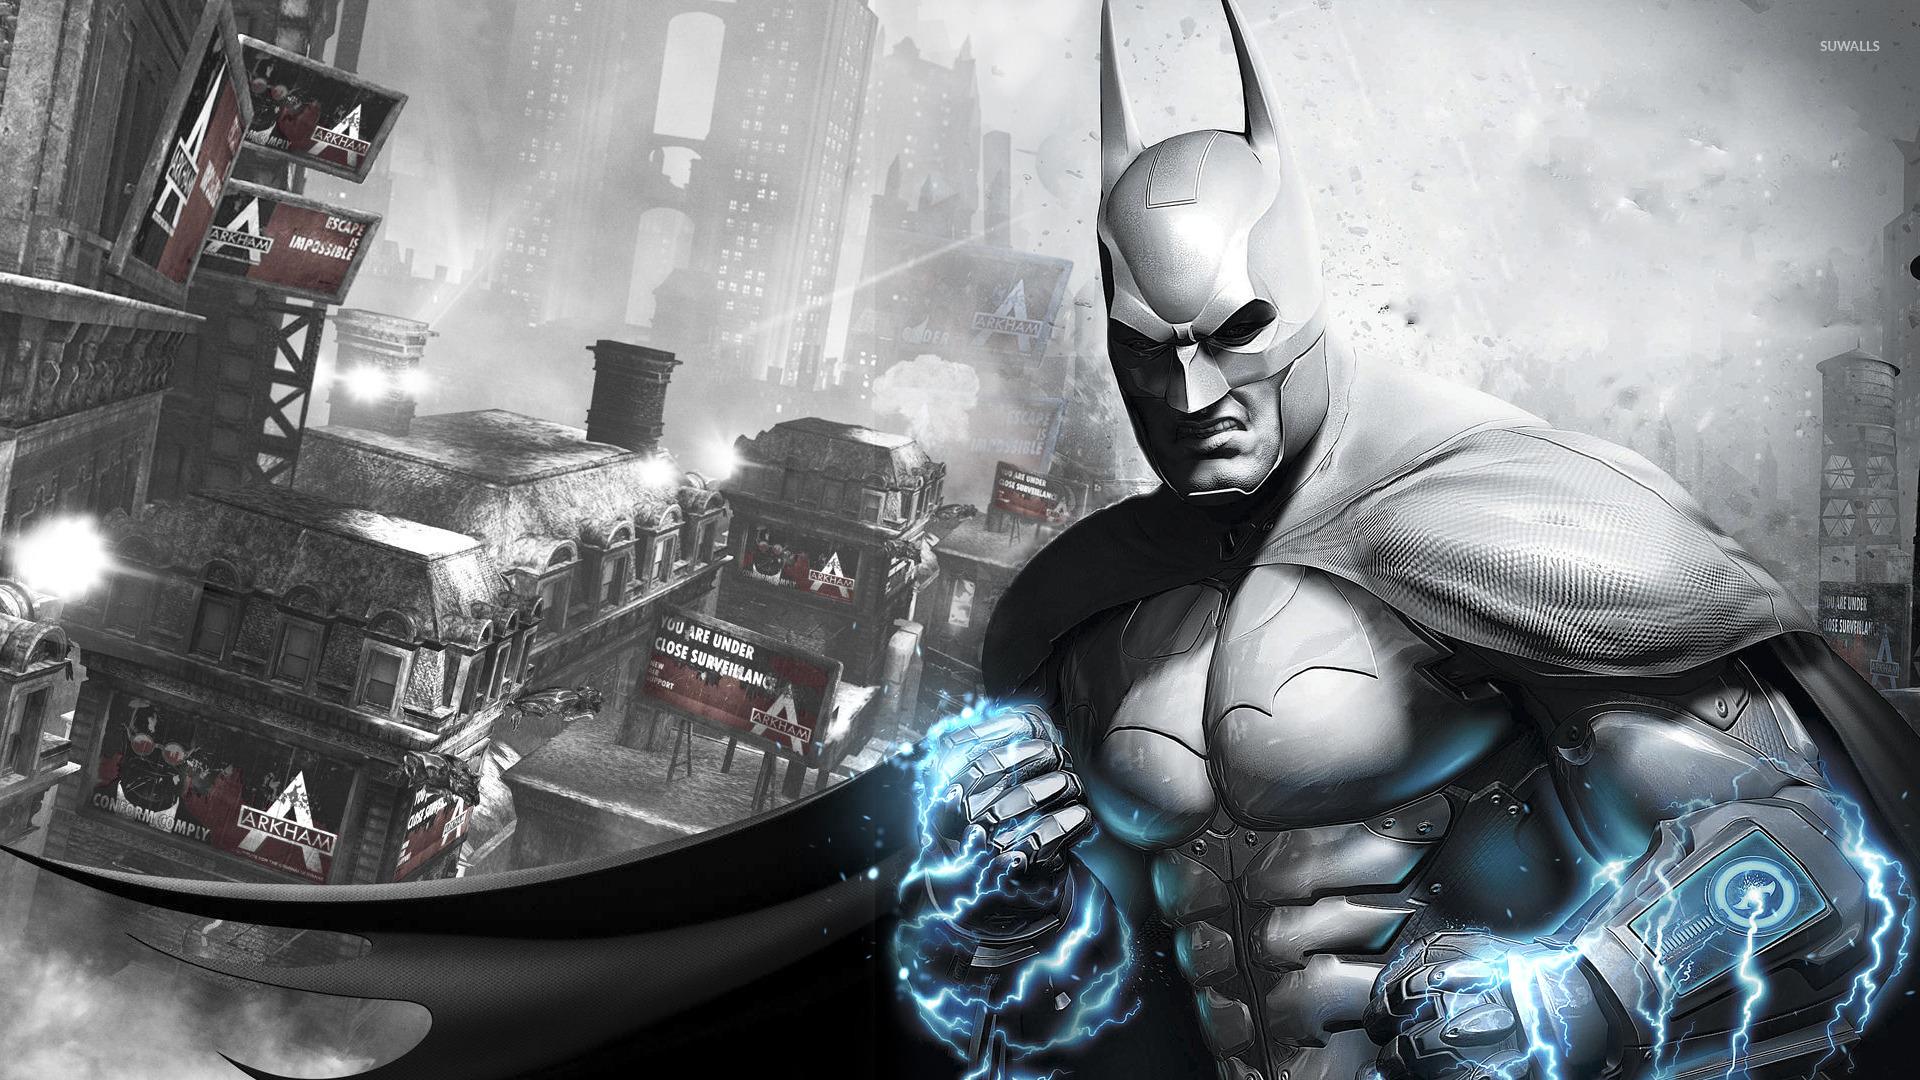 Batman Arkham City 8 Wallpaper 1920x1080 Jpg